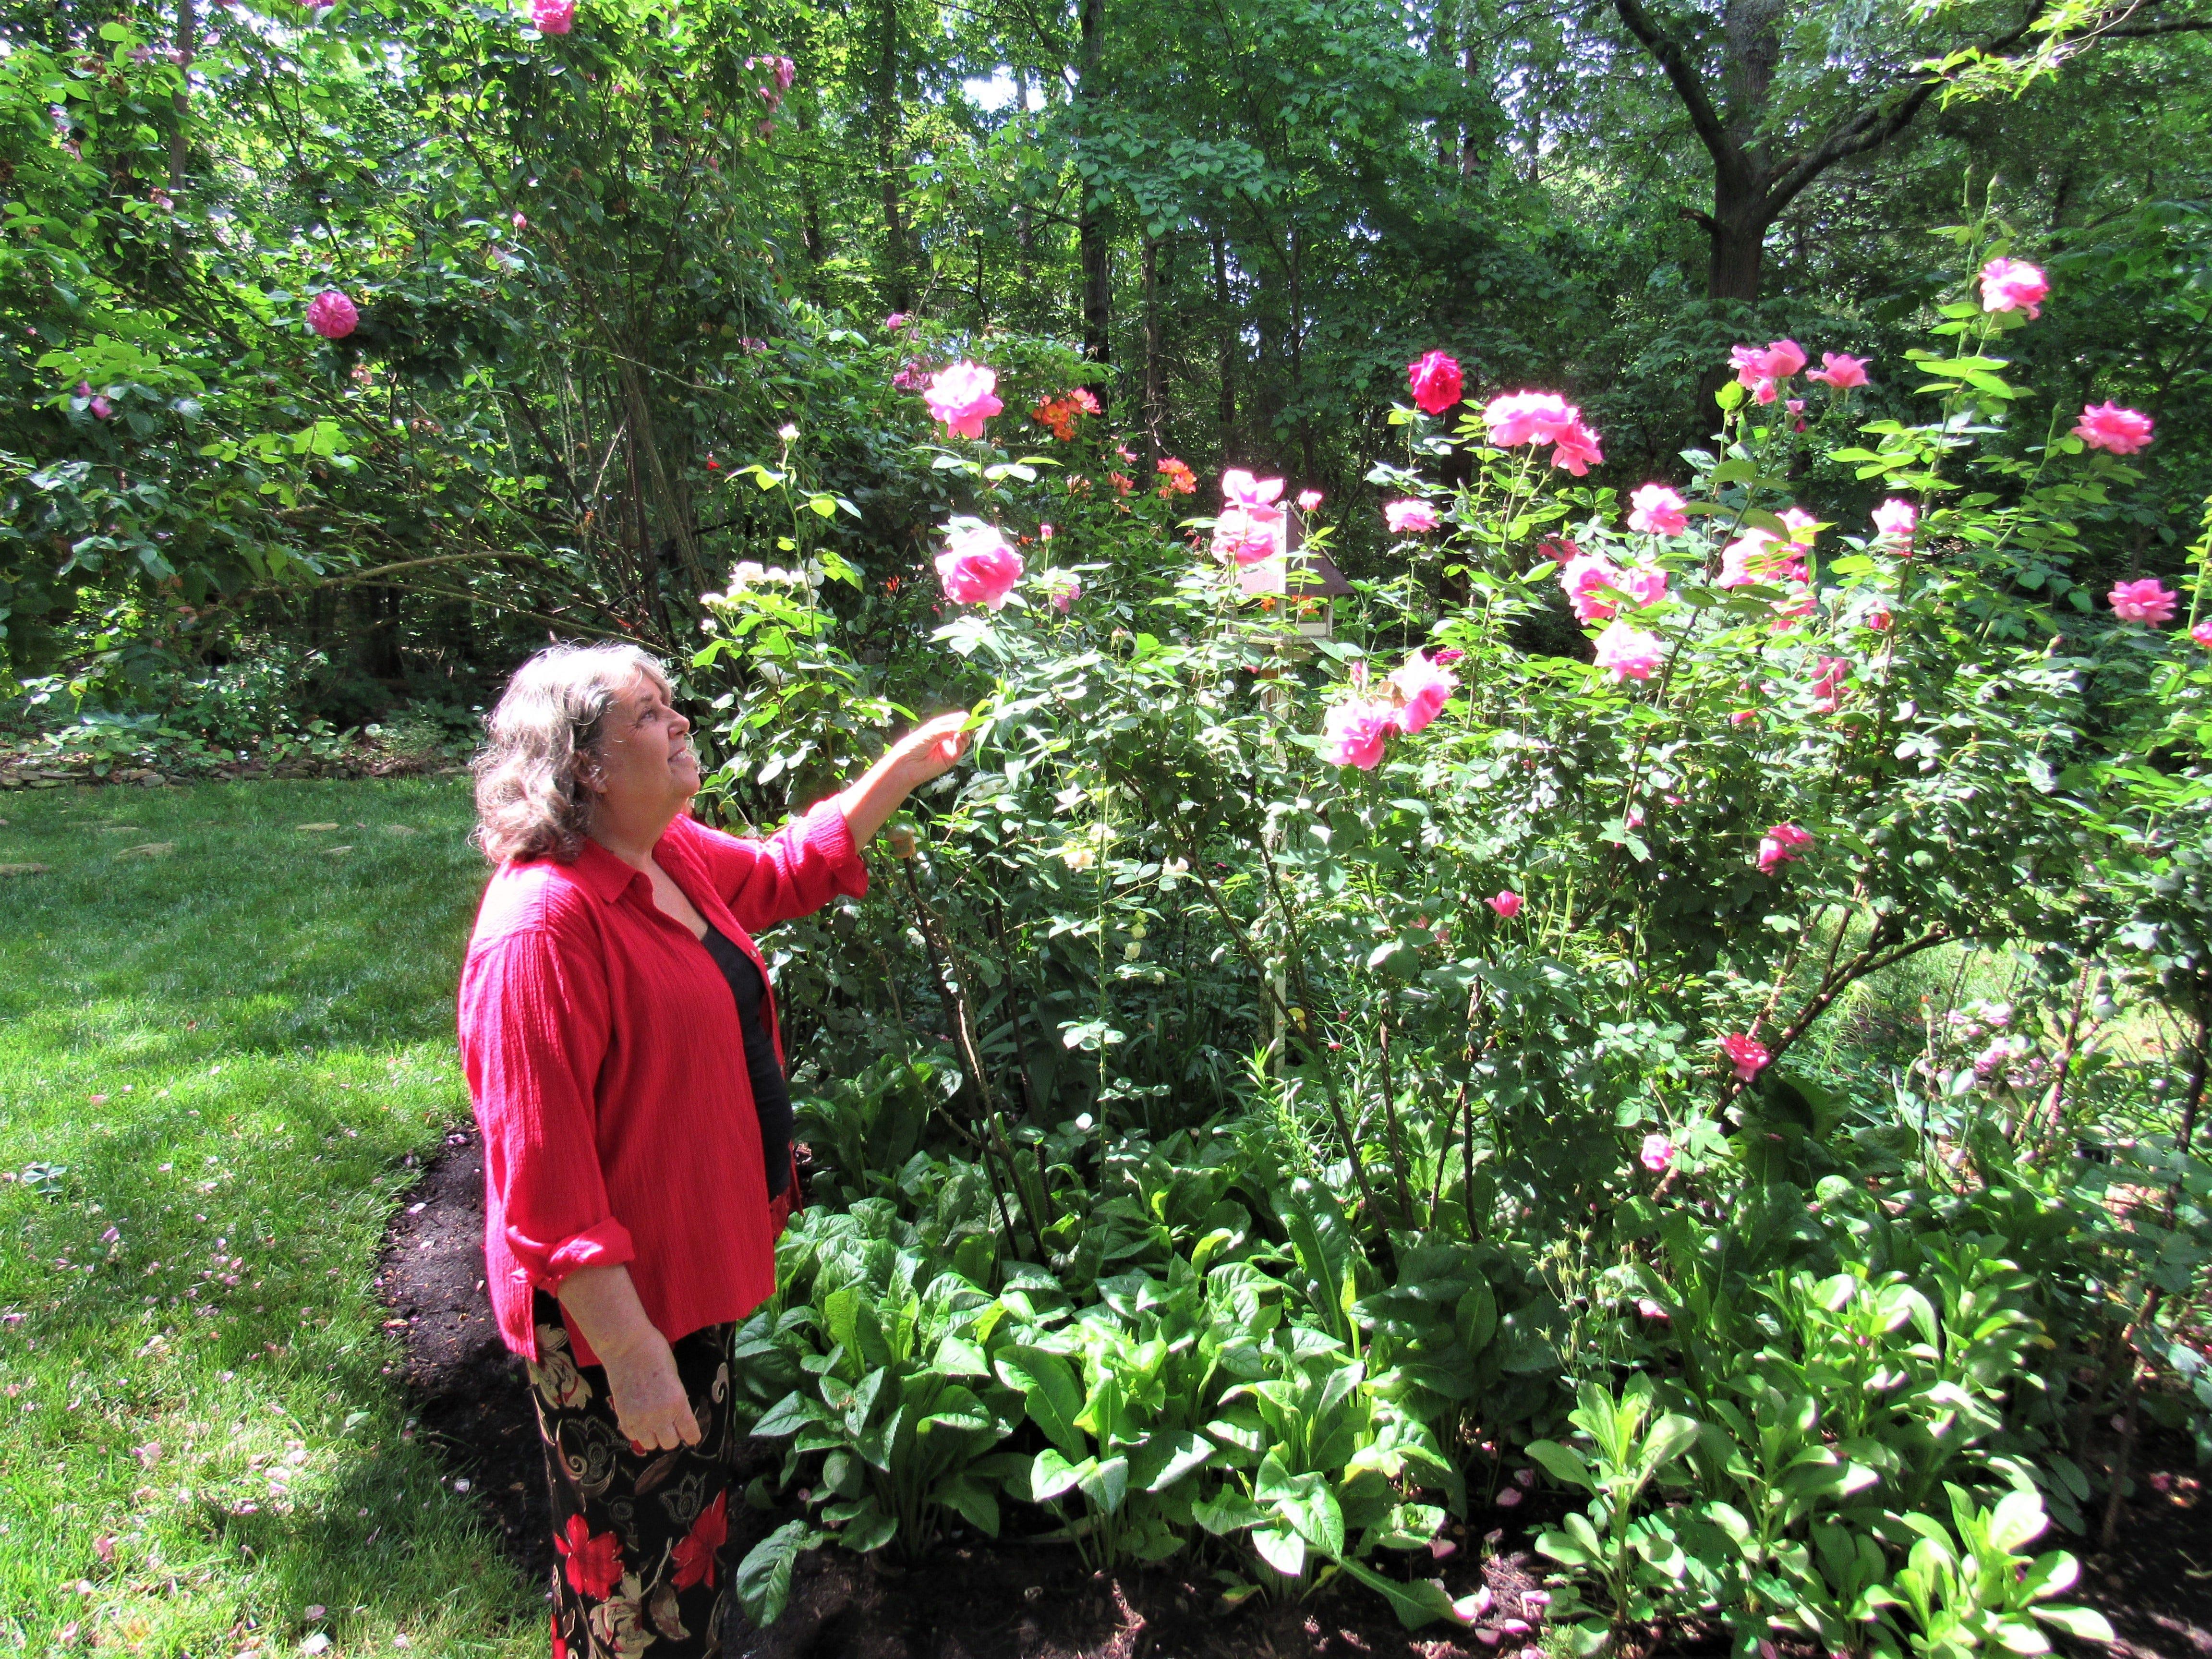 Shopper News blog: Gardening guru shares tips for showcase yard